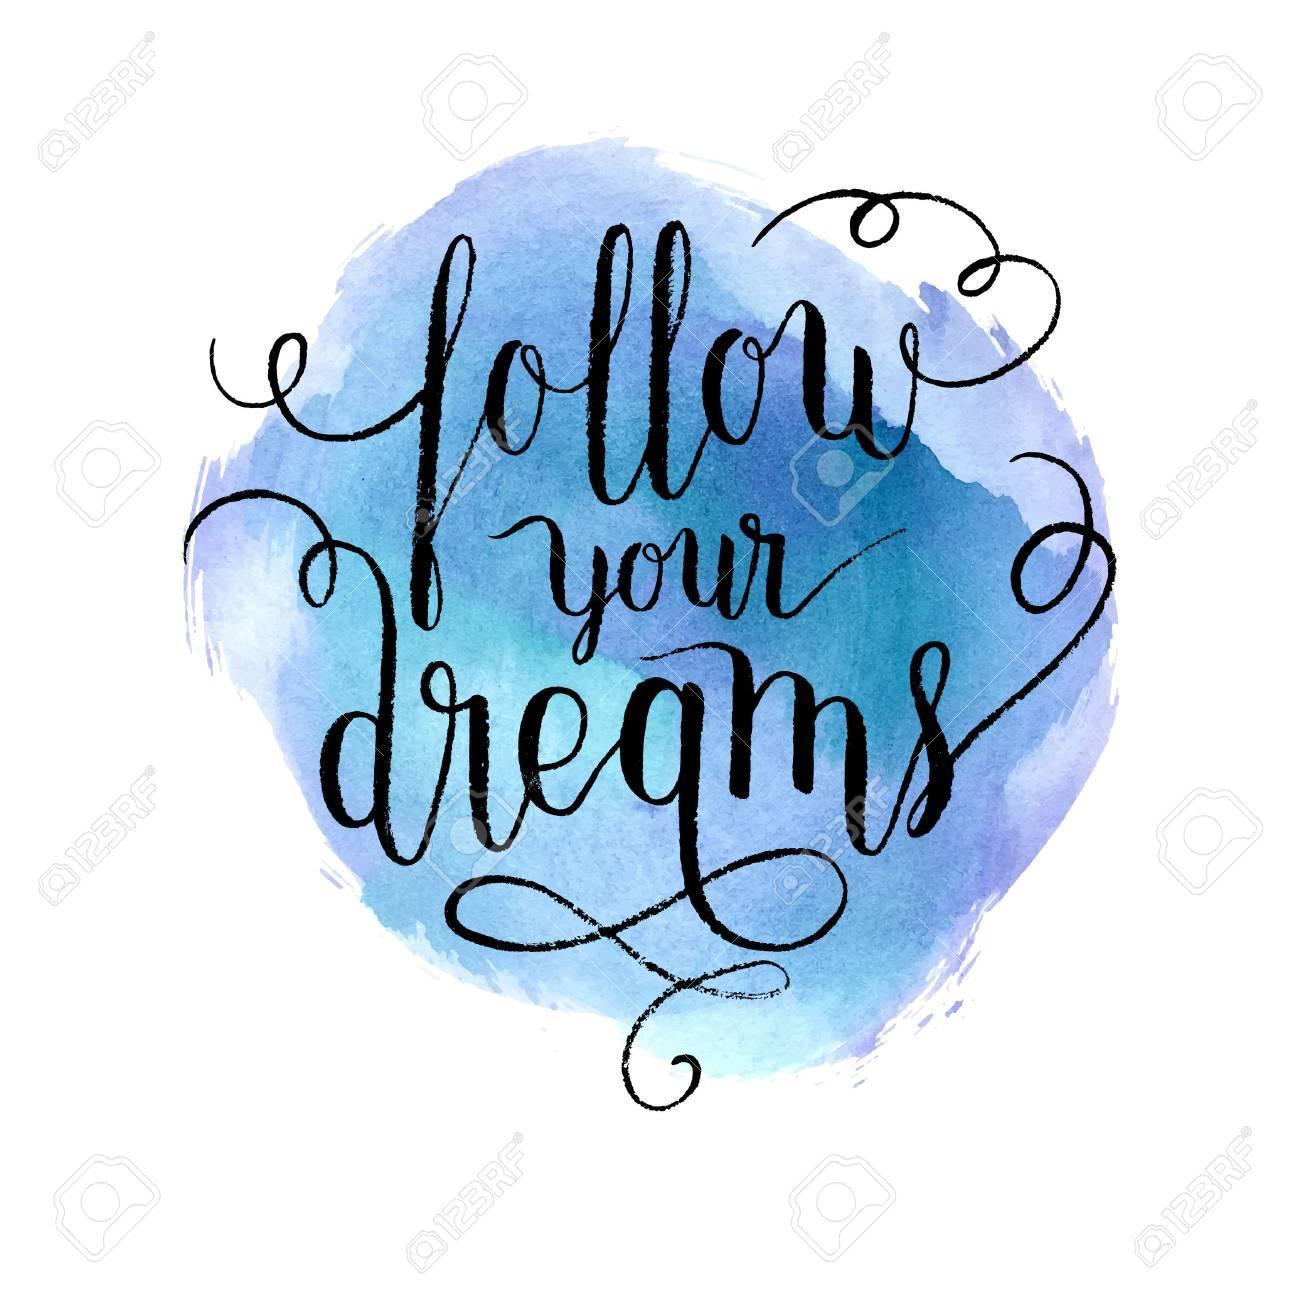 Follow your dreams clipart 6 » Clipart Portal.